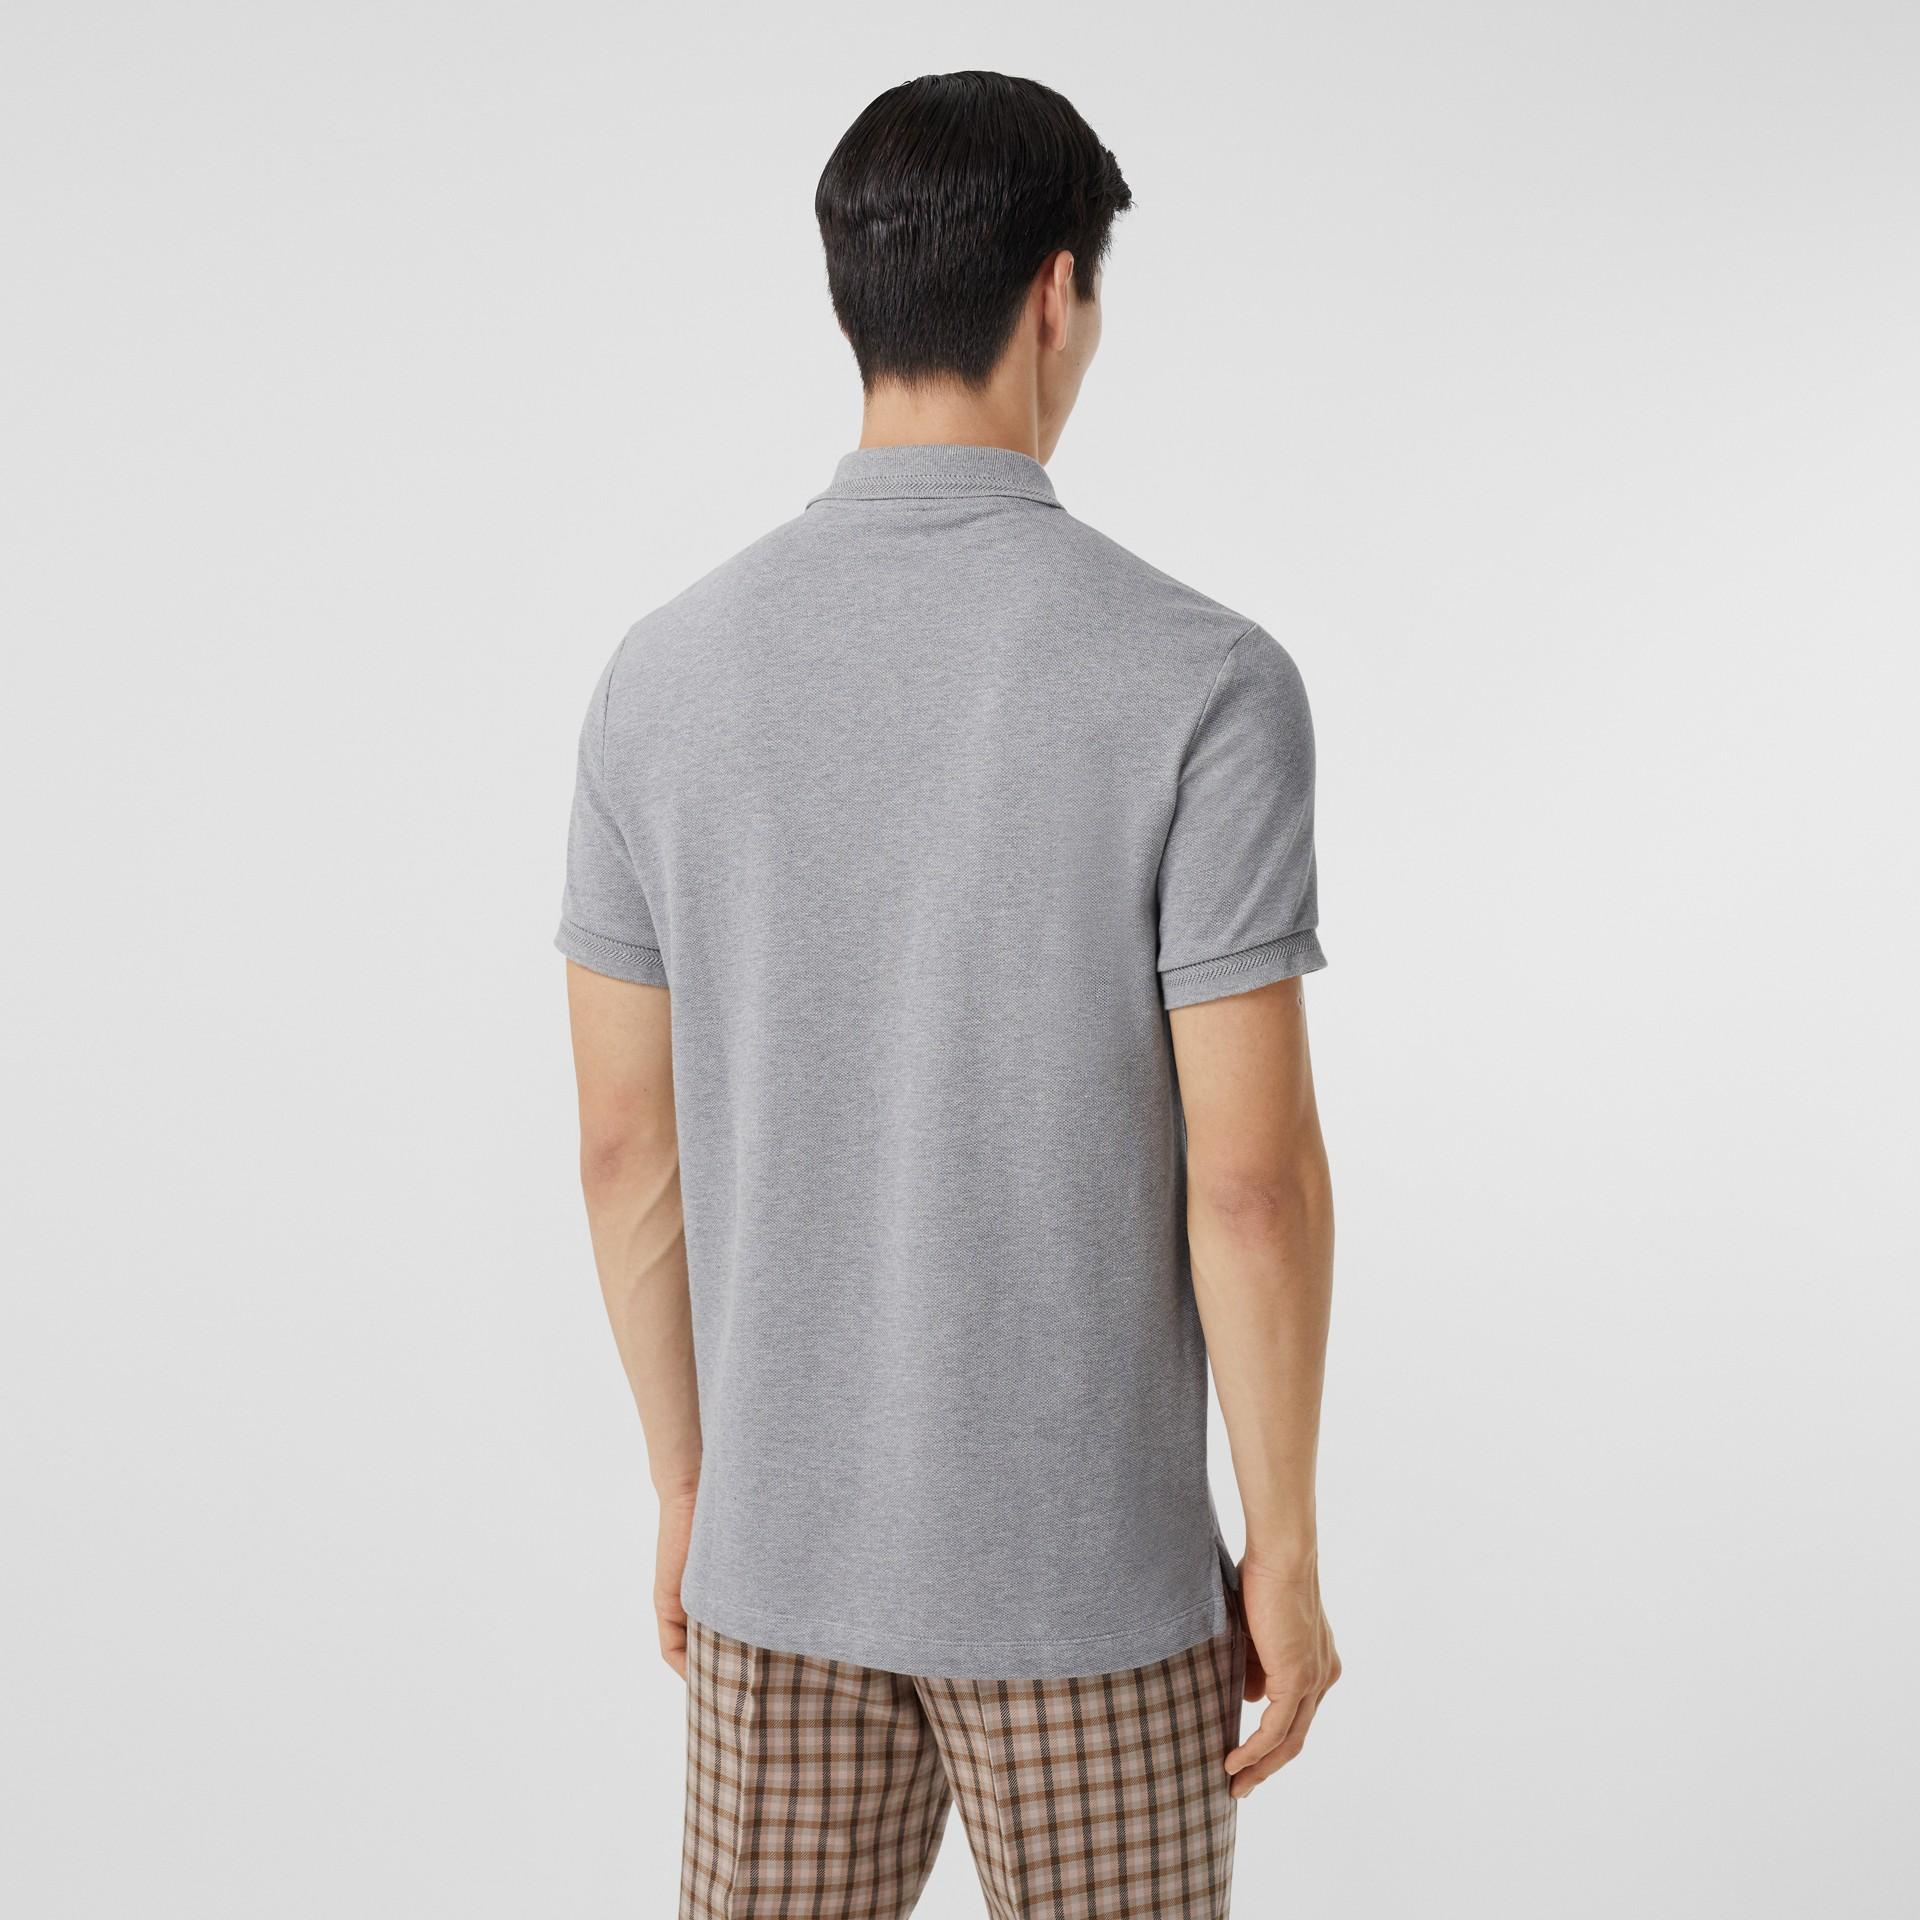 Button Detail Cotton Piqué Polo Shirt in Pale Grey Melange - Men | Burberry Canada - gallery image 2